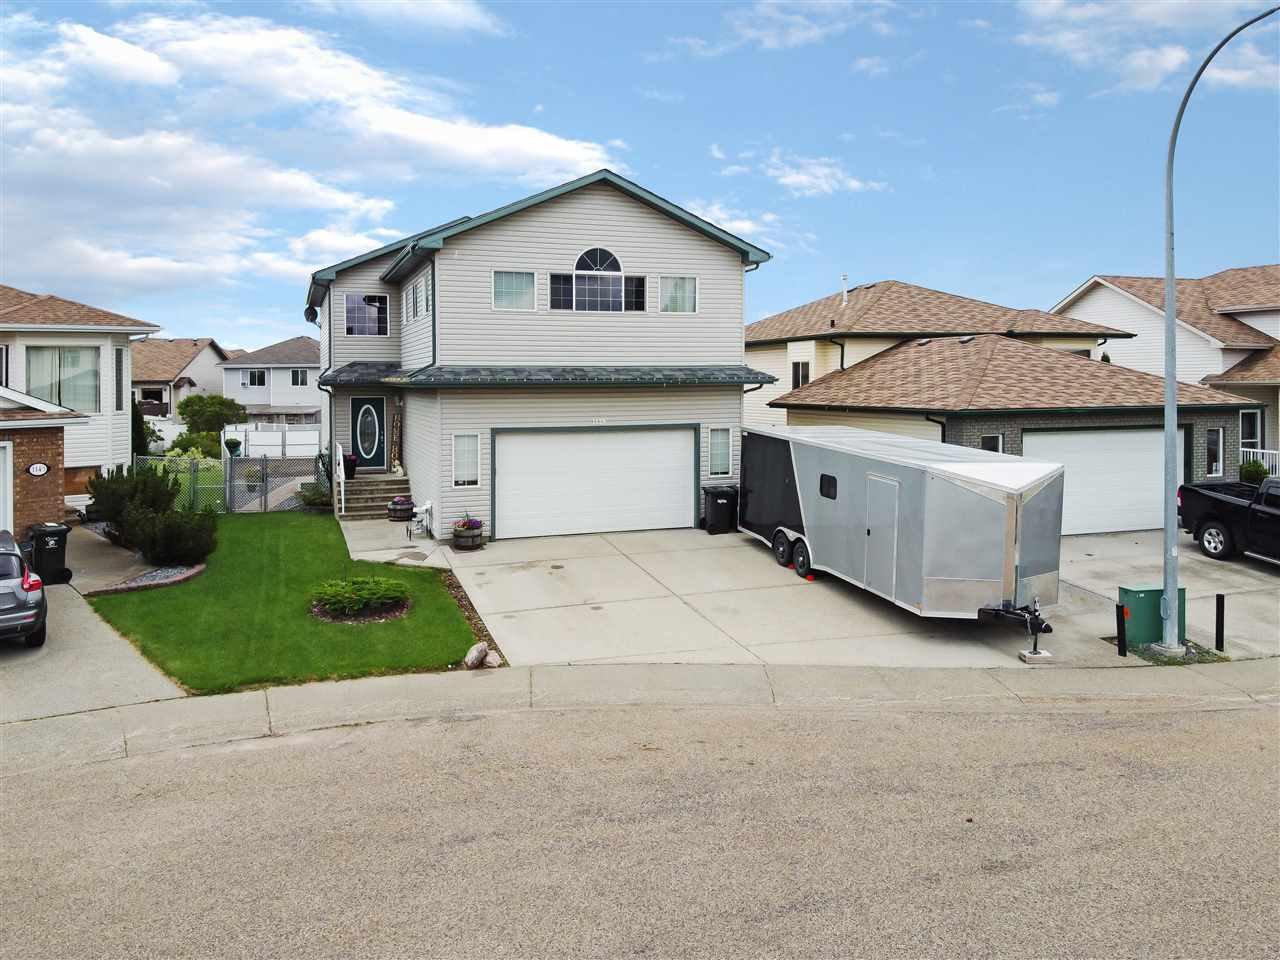 Main Photo: 1139 OAKLAND Drive: Devon House for sale : MLS®# E4204145